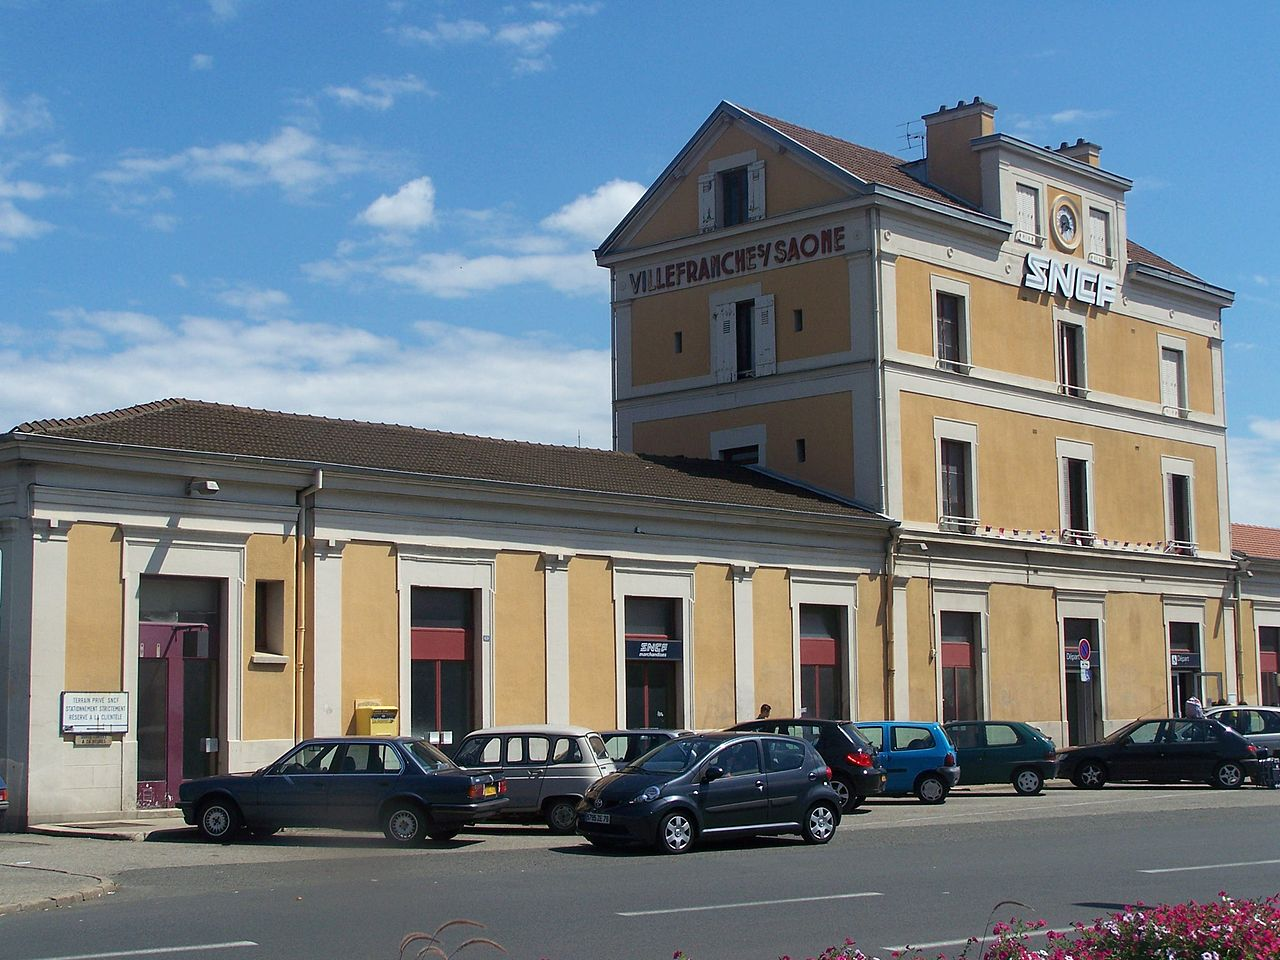 Villefranche-sur-Saone-train-station